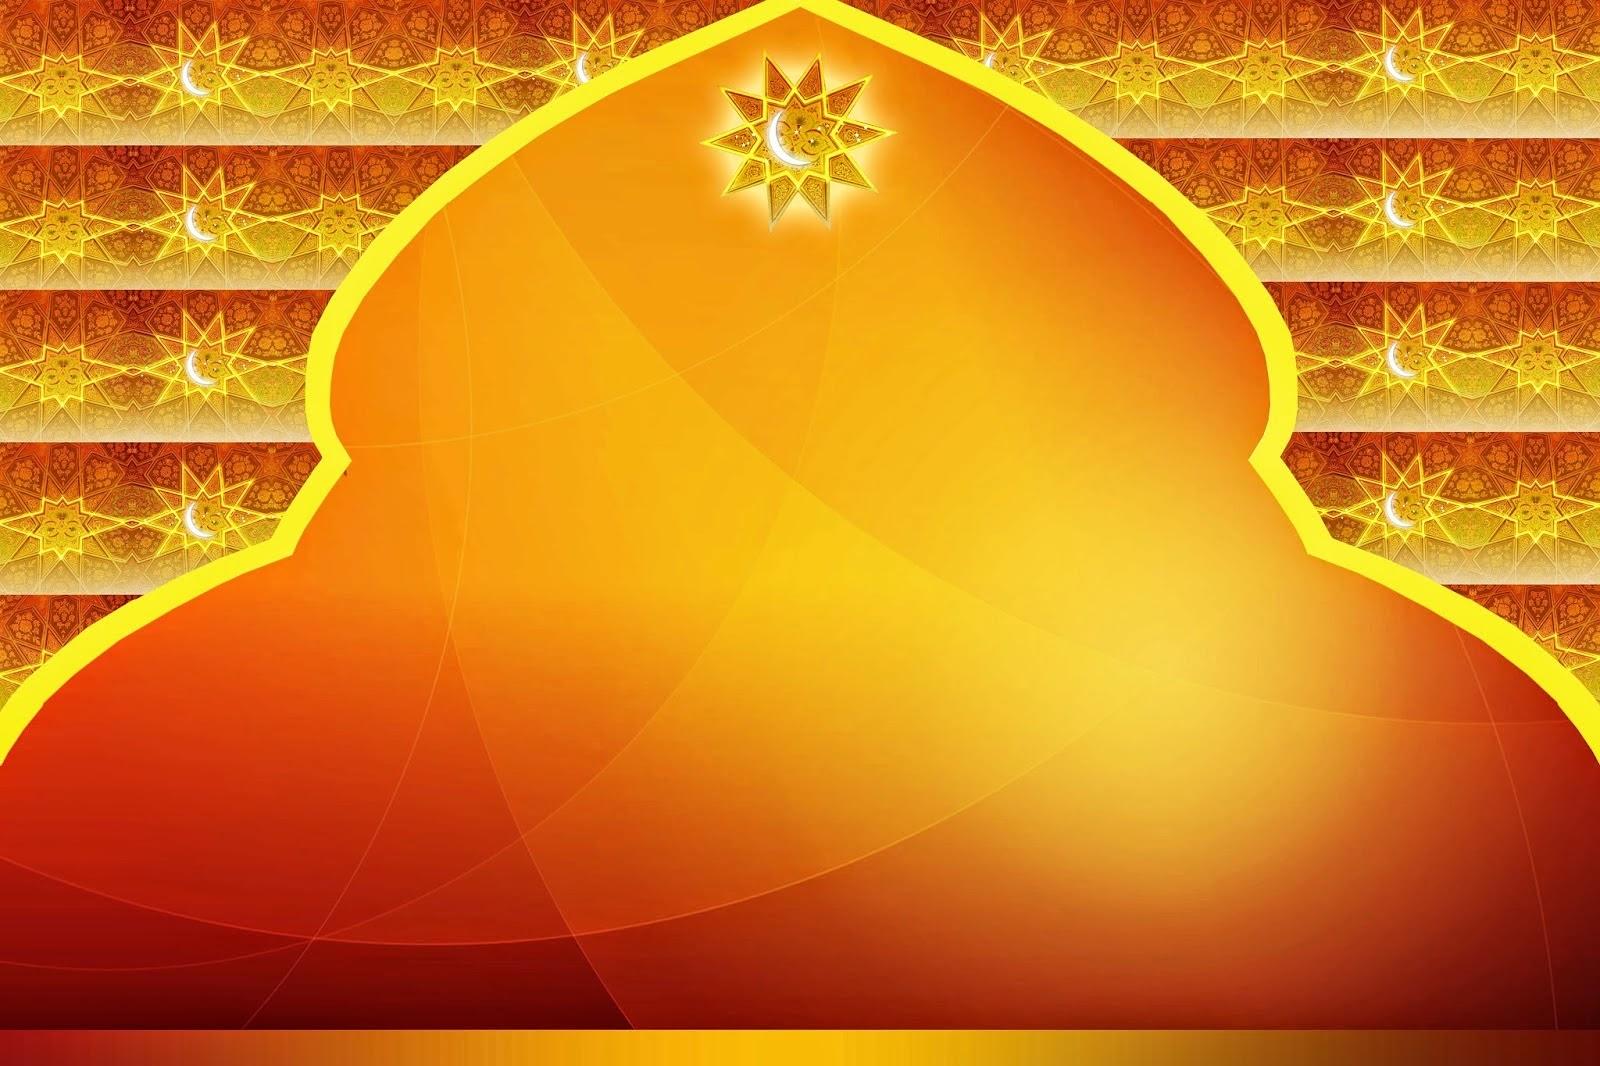 http://kuwarasanku.blogspot.com/2015/01/background-islami-2015.html